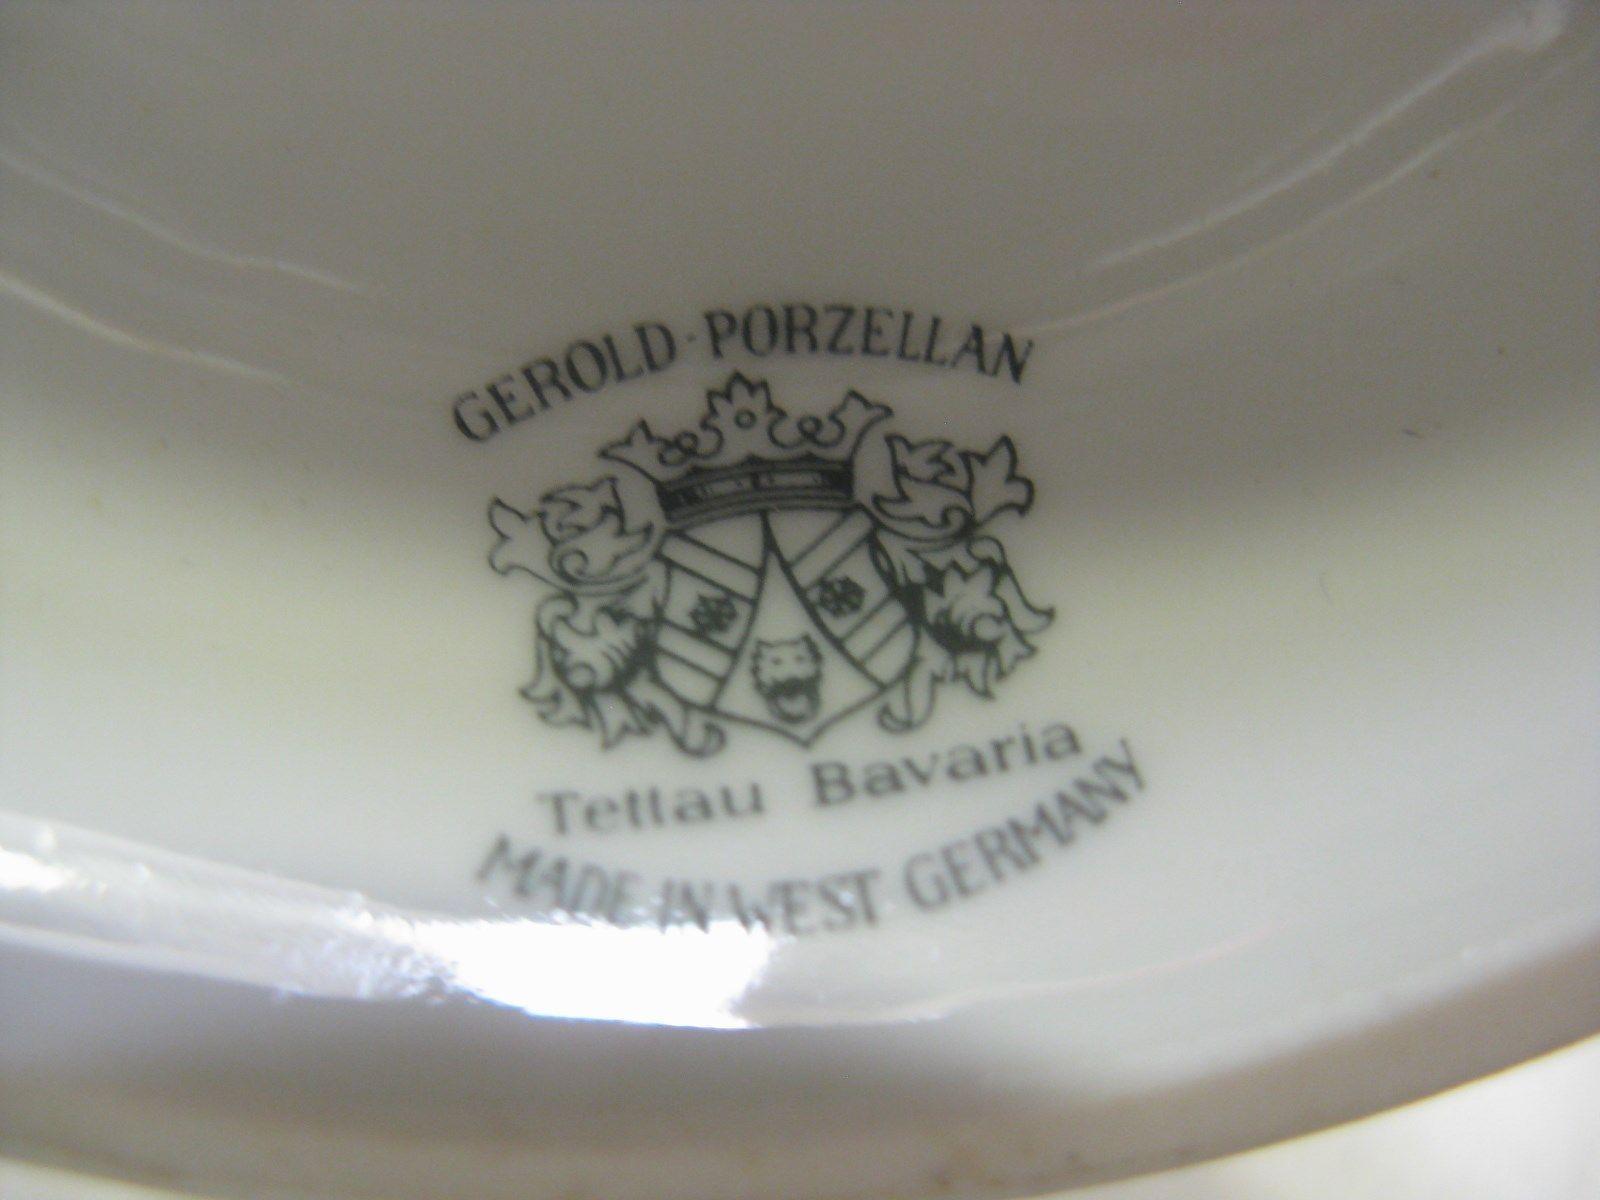 gerold porzellan vase of gerold porzellan ceramic mug river house west germany stein tique in gerold porzellan